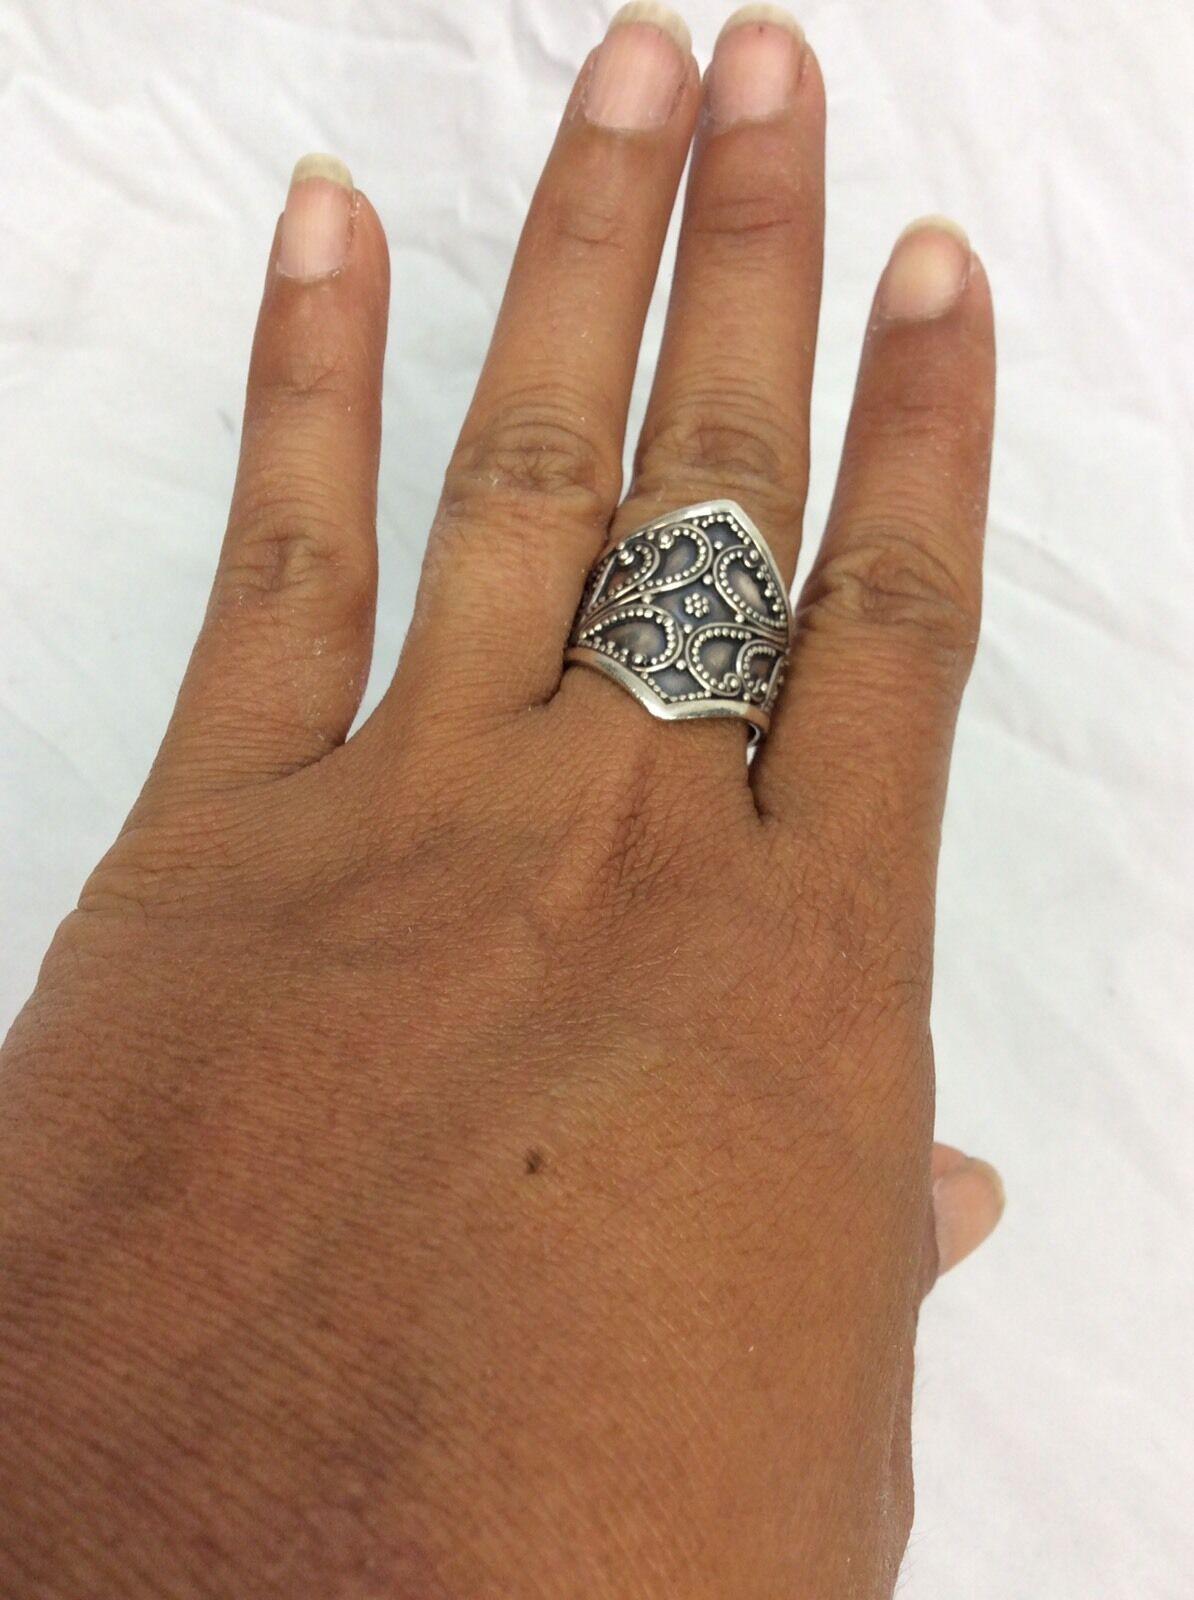 Beautiful Bali Indonesia sterling 925 Ornate ring size 9